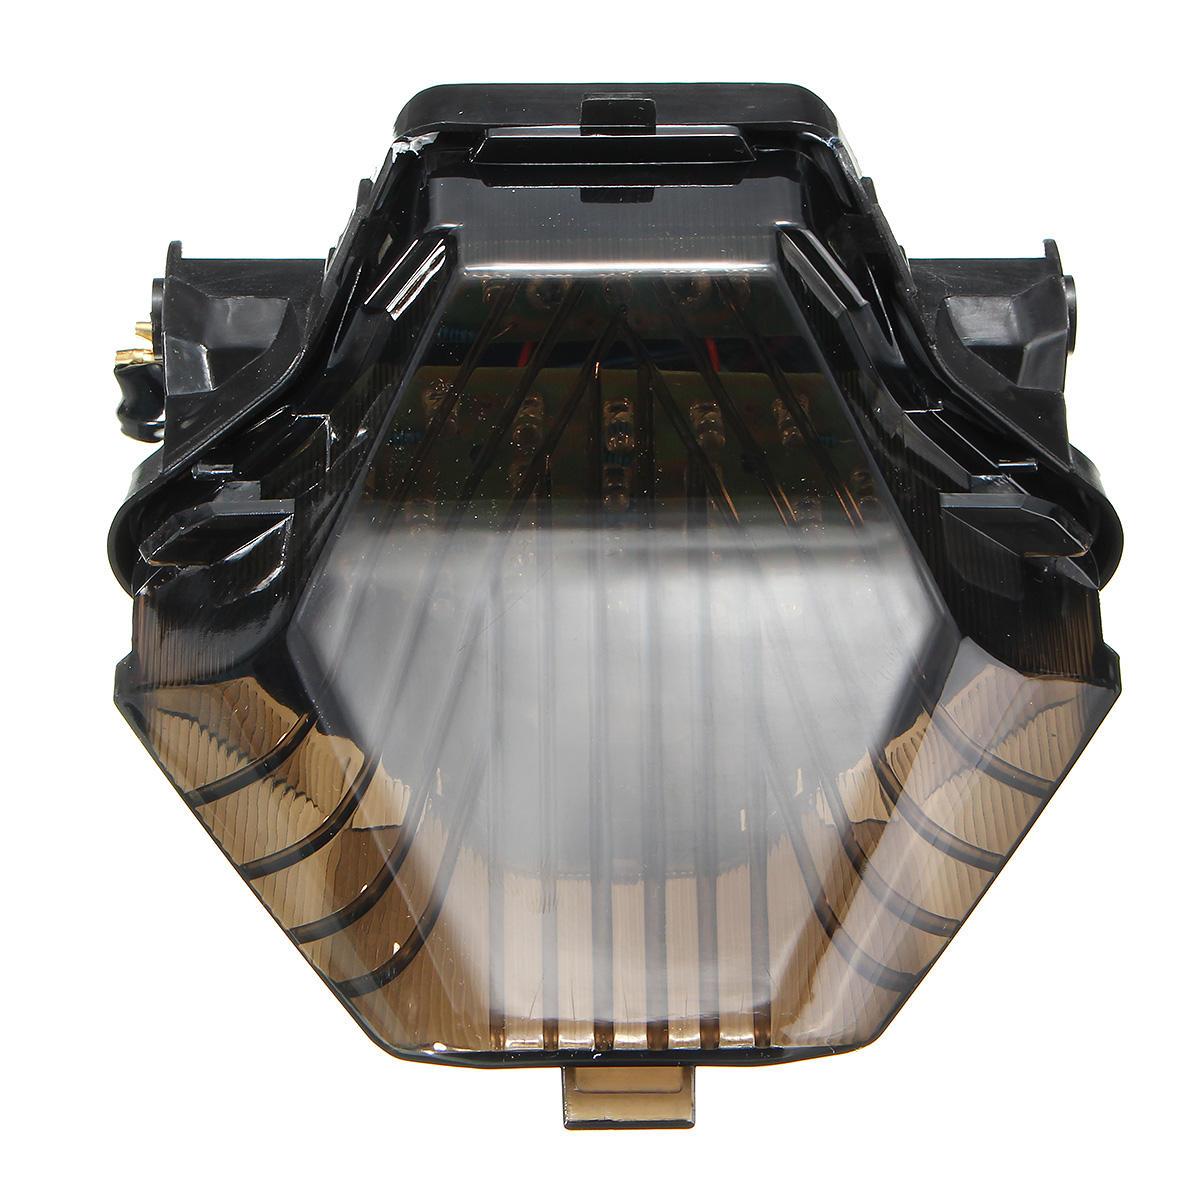 CNSUNNYLIGHT Car/Motorcycle LED Decoration Lights Emergency Signal Wings Lamp Projector Fog Warning - 3